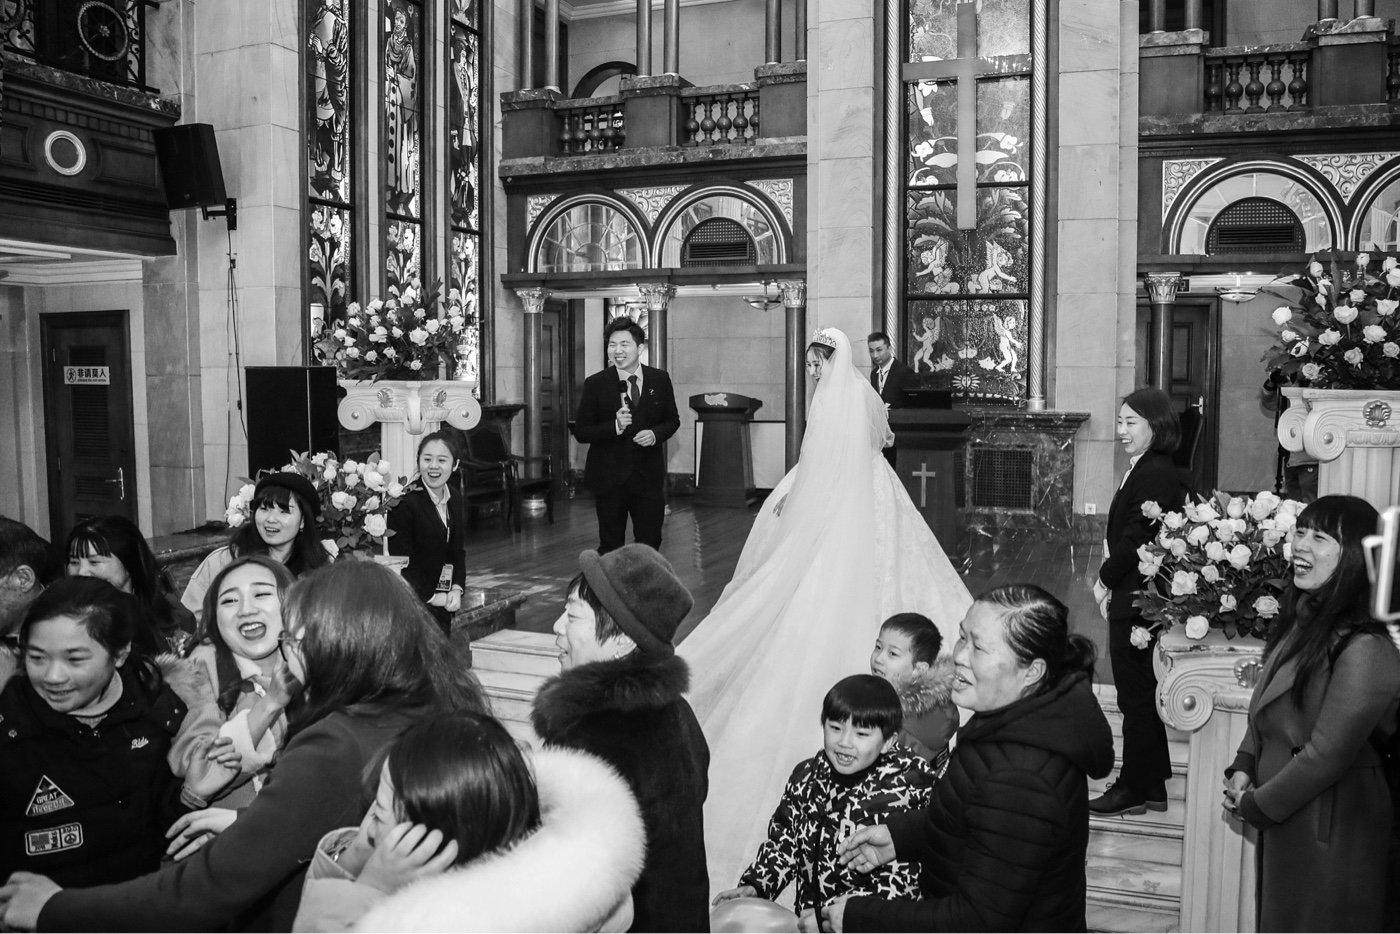 「Fantasy Wedding」&明珠教堂⛪3